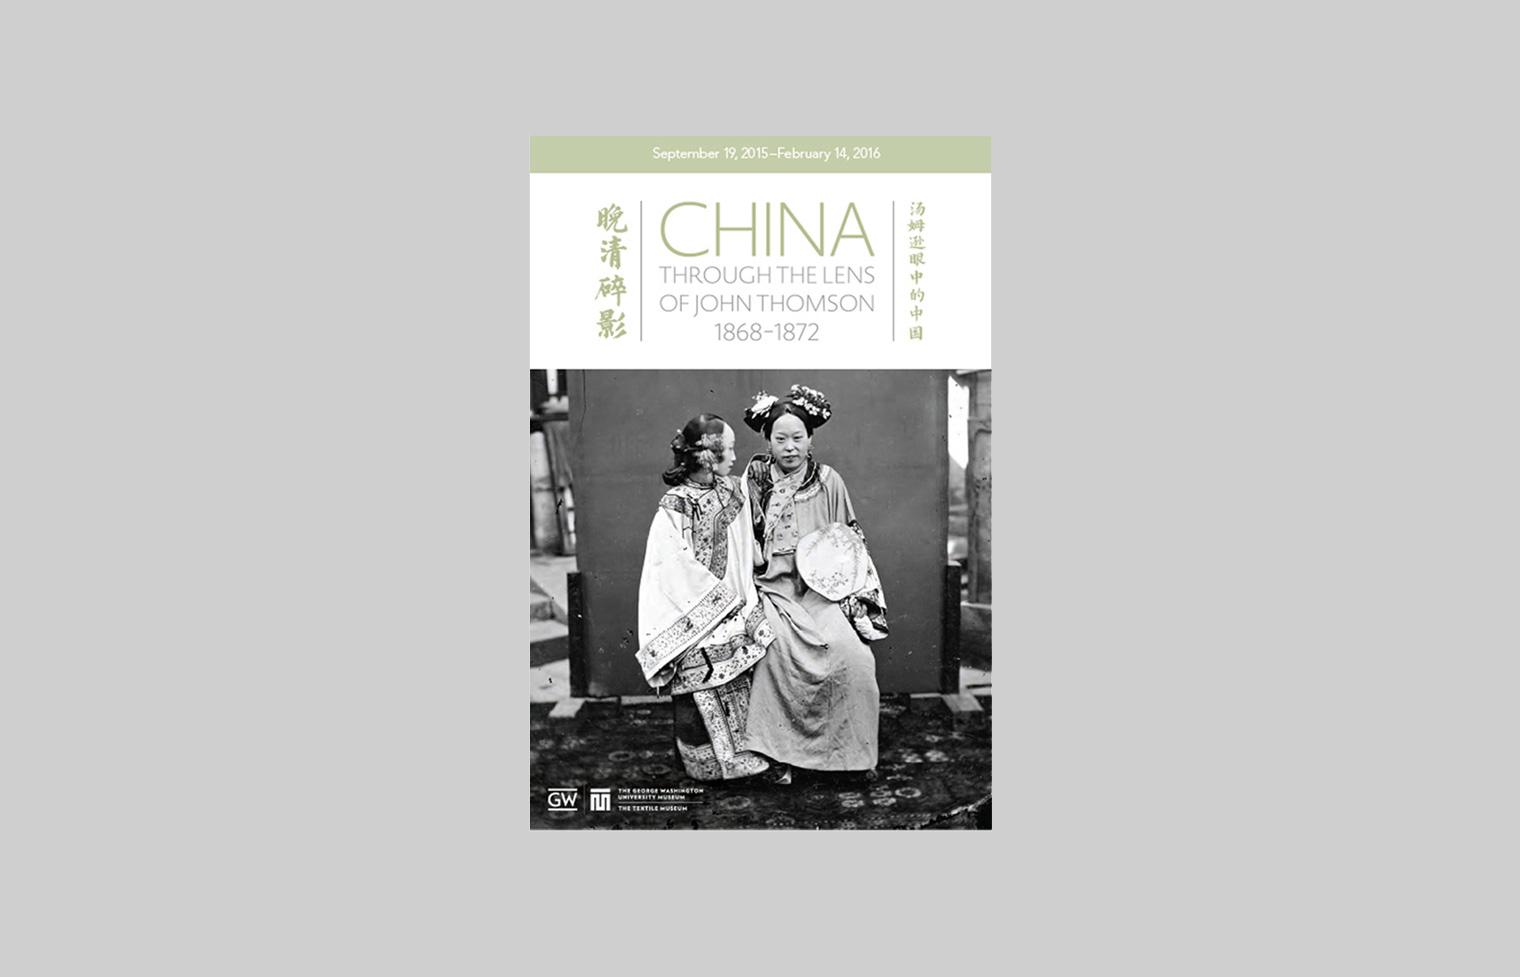 China Through the Lens of John Thomson